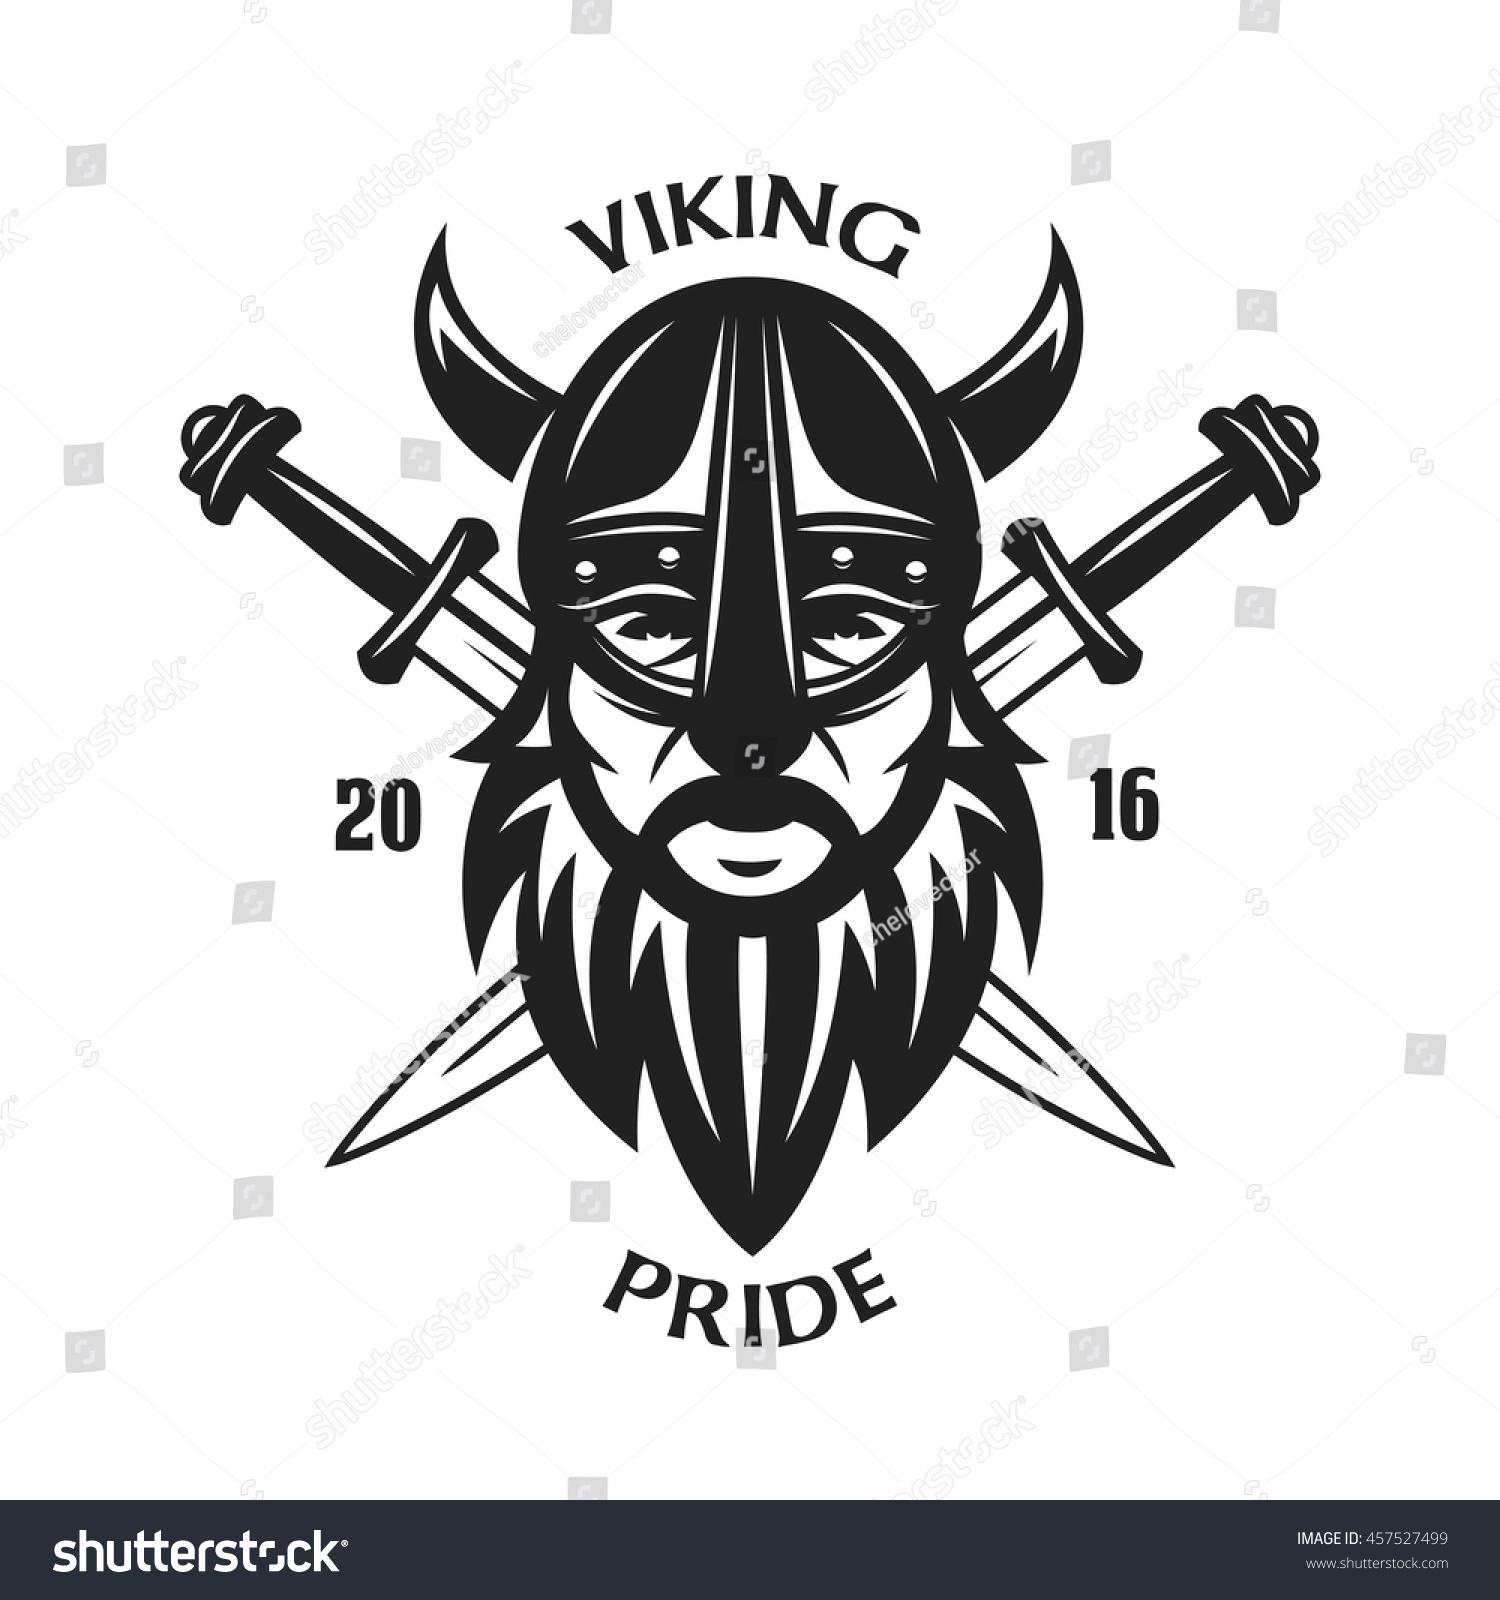 Shirt design elements - Ancient Viking Head T Shirt Graphics And Design Elements Viking Pride Text Crossed